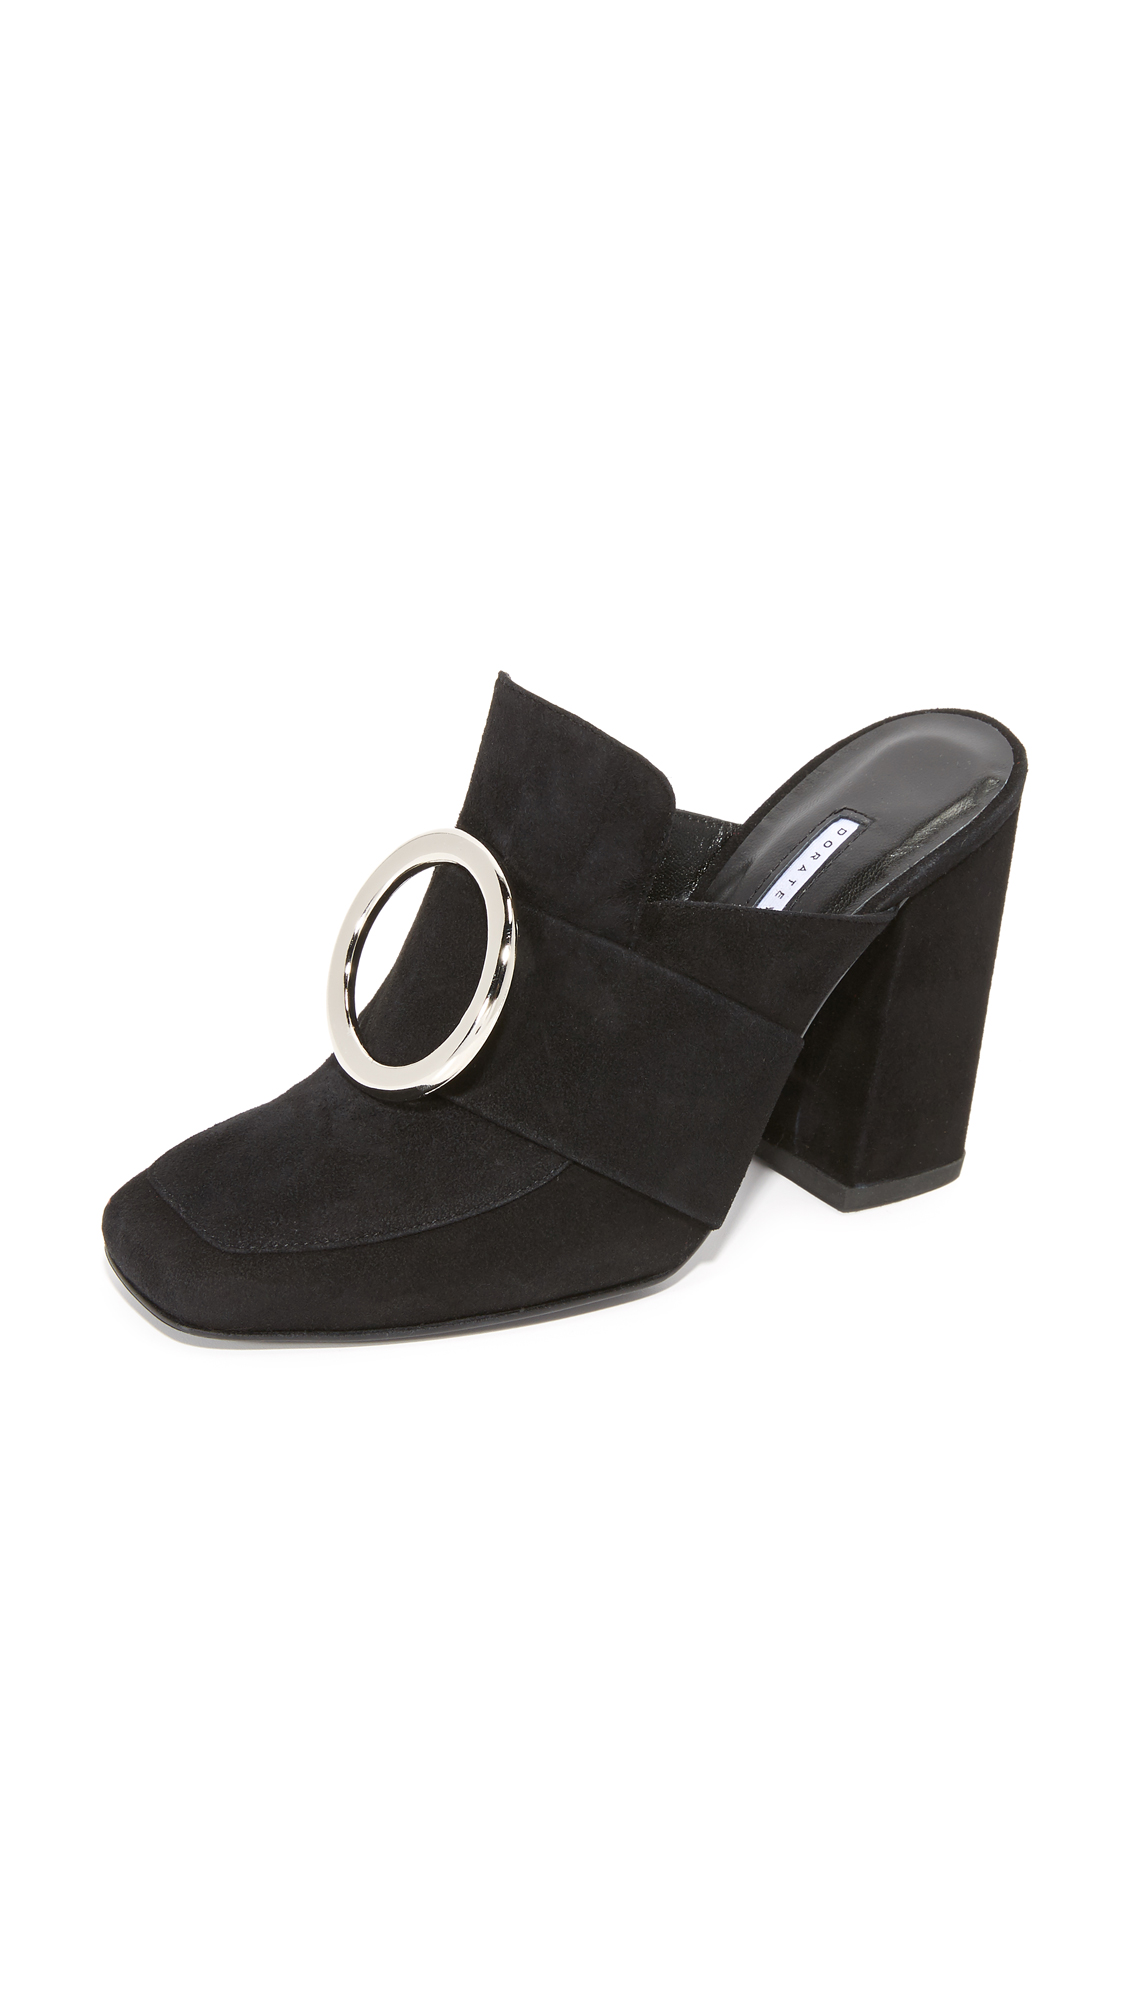 Dorateymur Munise Buckle Mules - Black at Shopbop